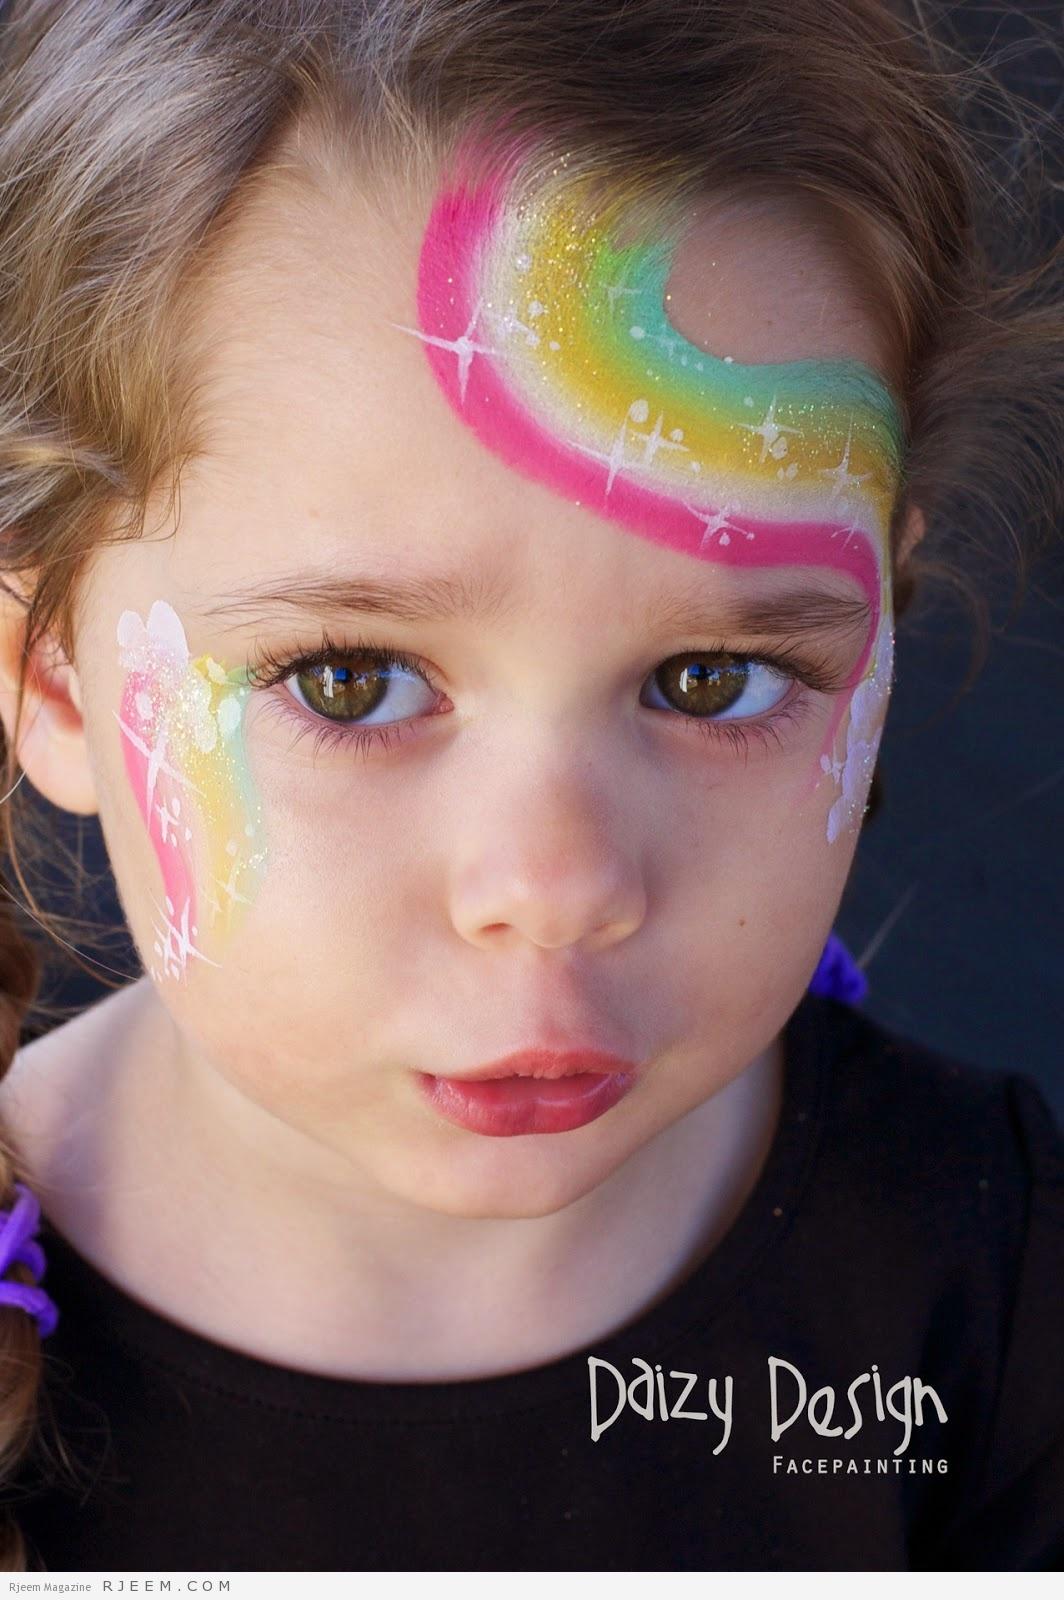 fba4ff0808fc9 نتيجة بحث الصور عن طريقه عمل الوان للرسم على وجوه الاطفال بطريقه امنه في  منزلك